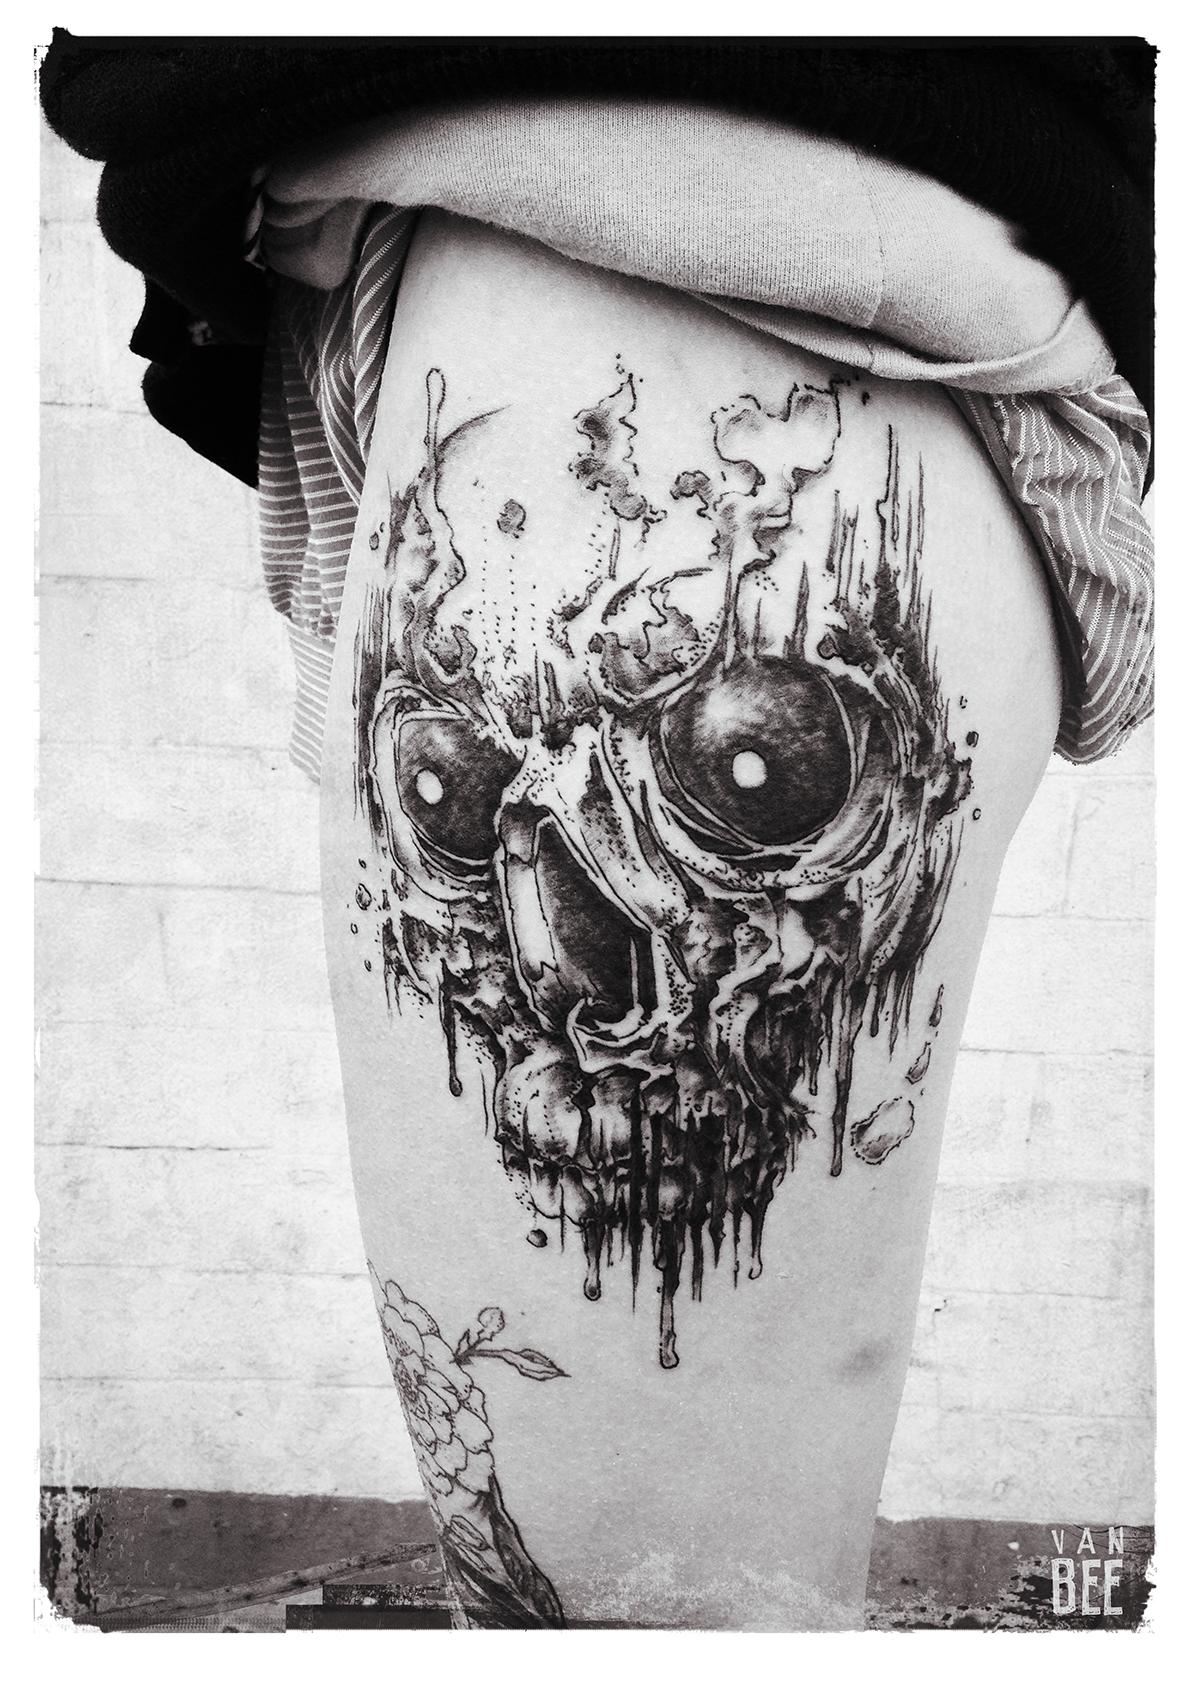 Van Bee, tattoo artist - the vandallist (2)